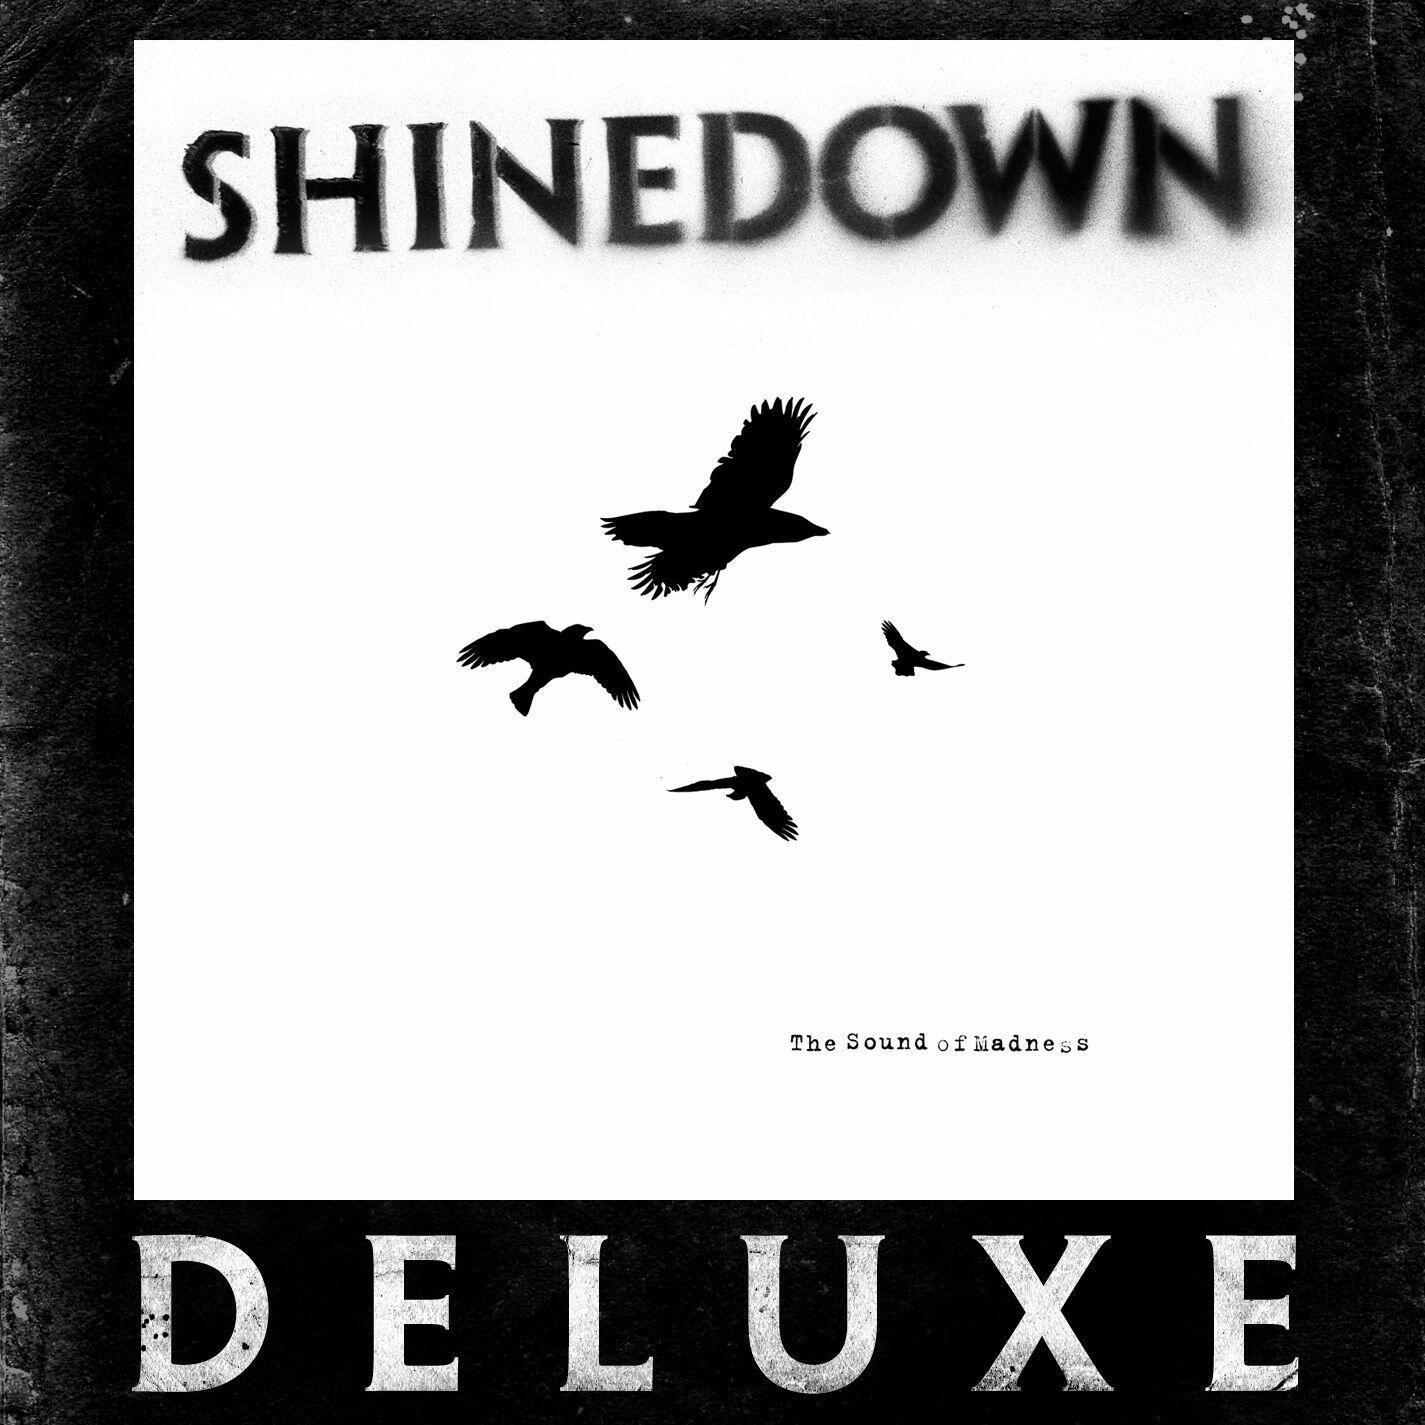 shinedown misfits mp3 download